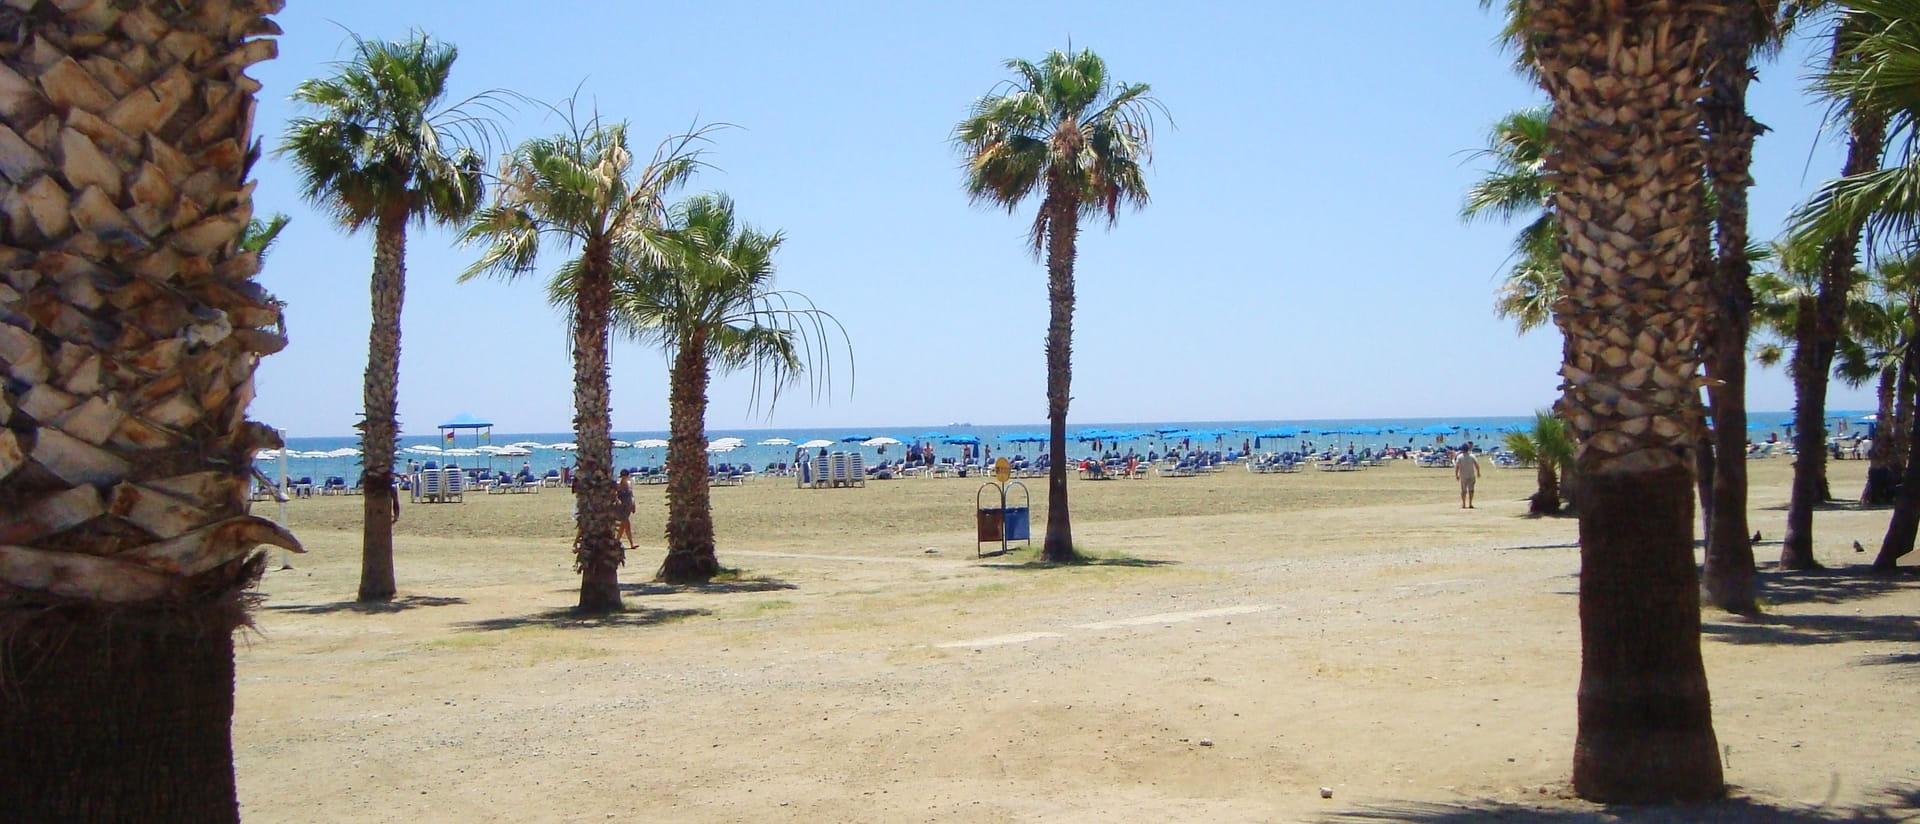 Destination Larnaca - Summer Holidays